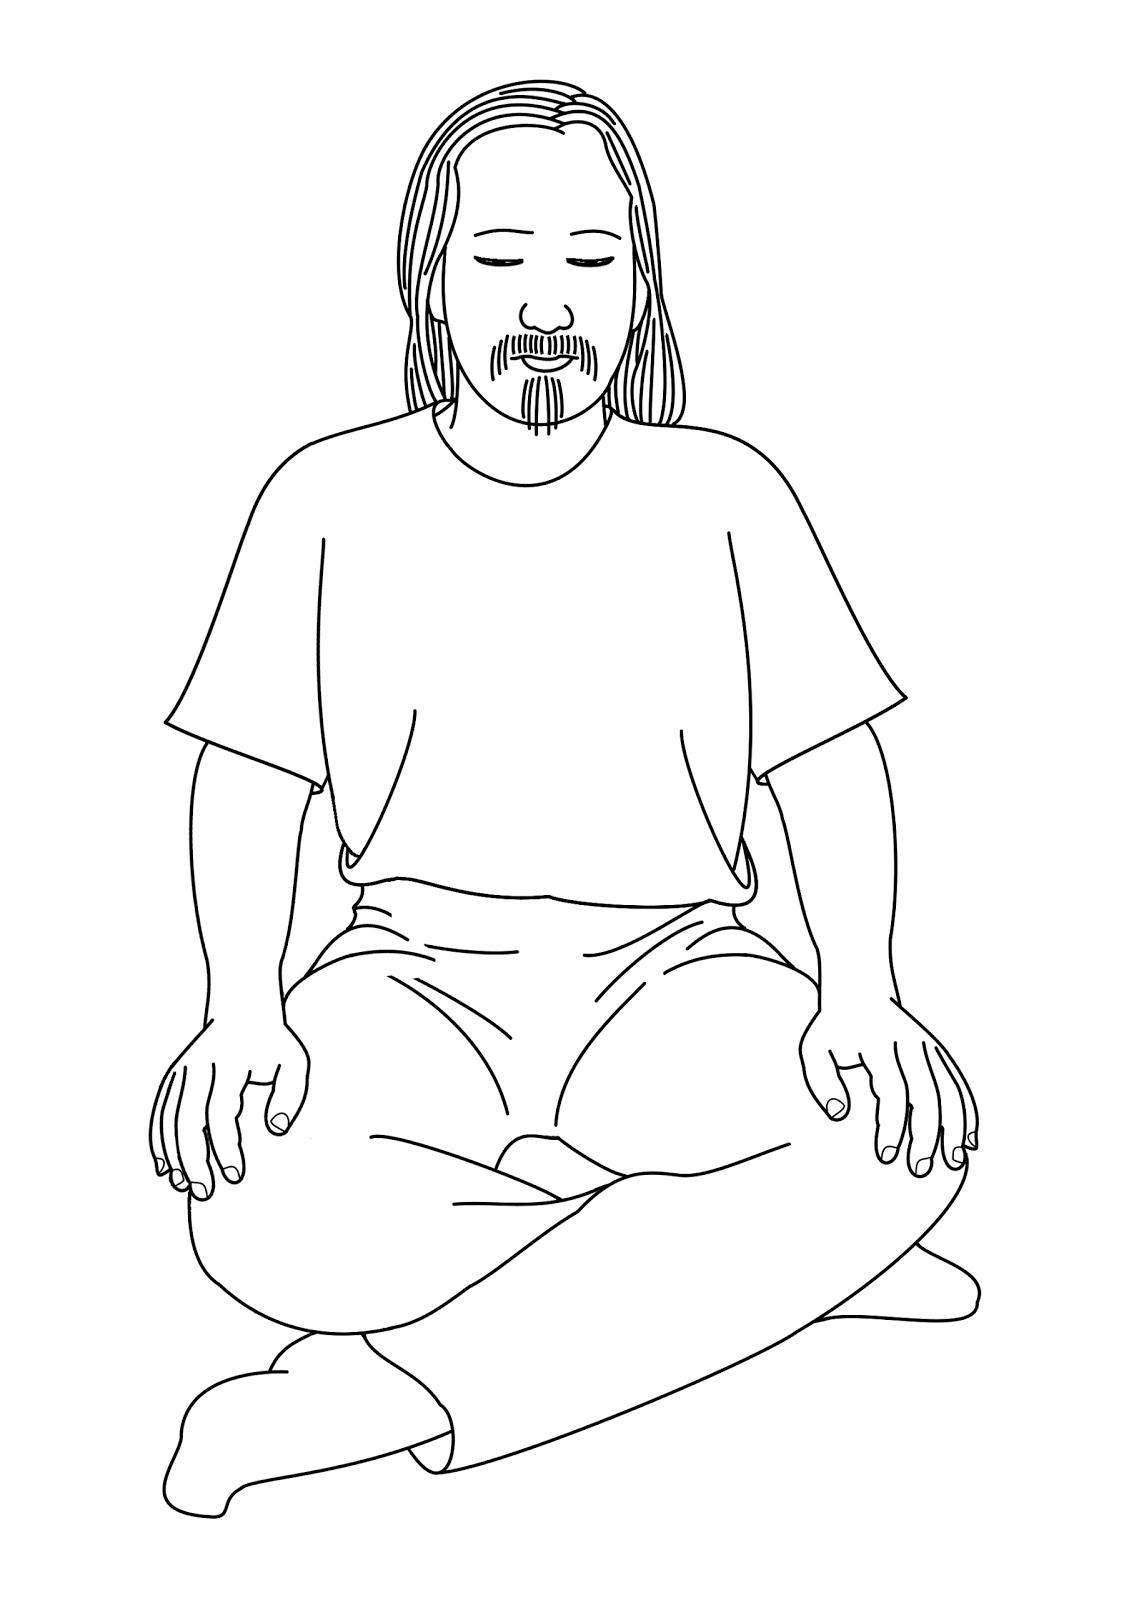 Ngakma Nor'dzin Pamo: Are you sitting comfortably?